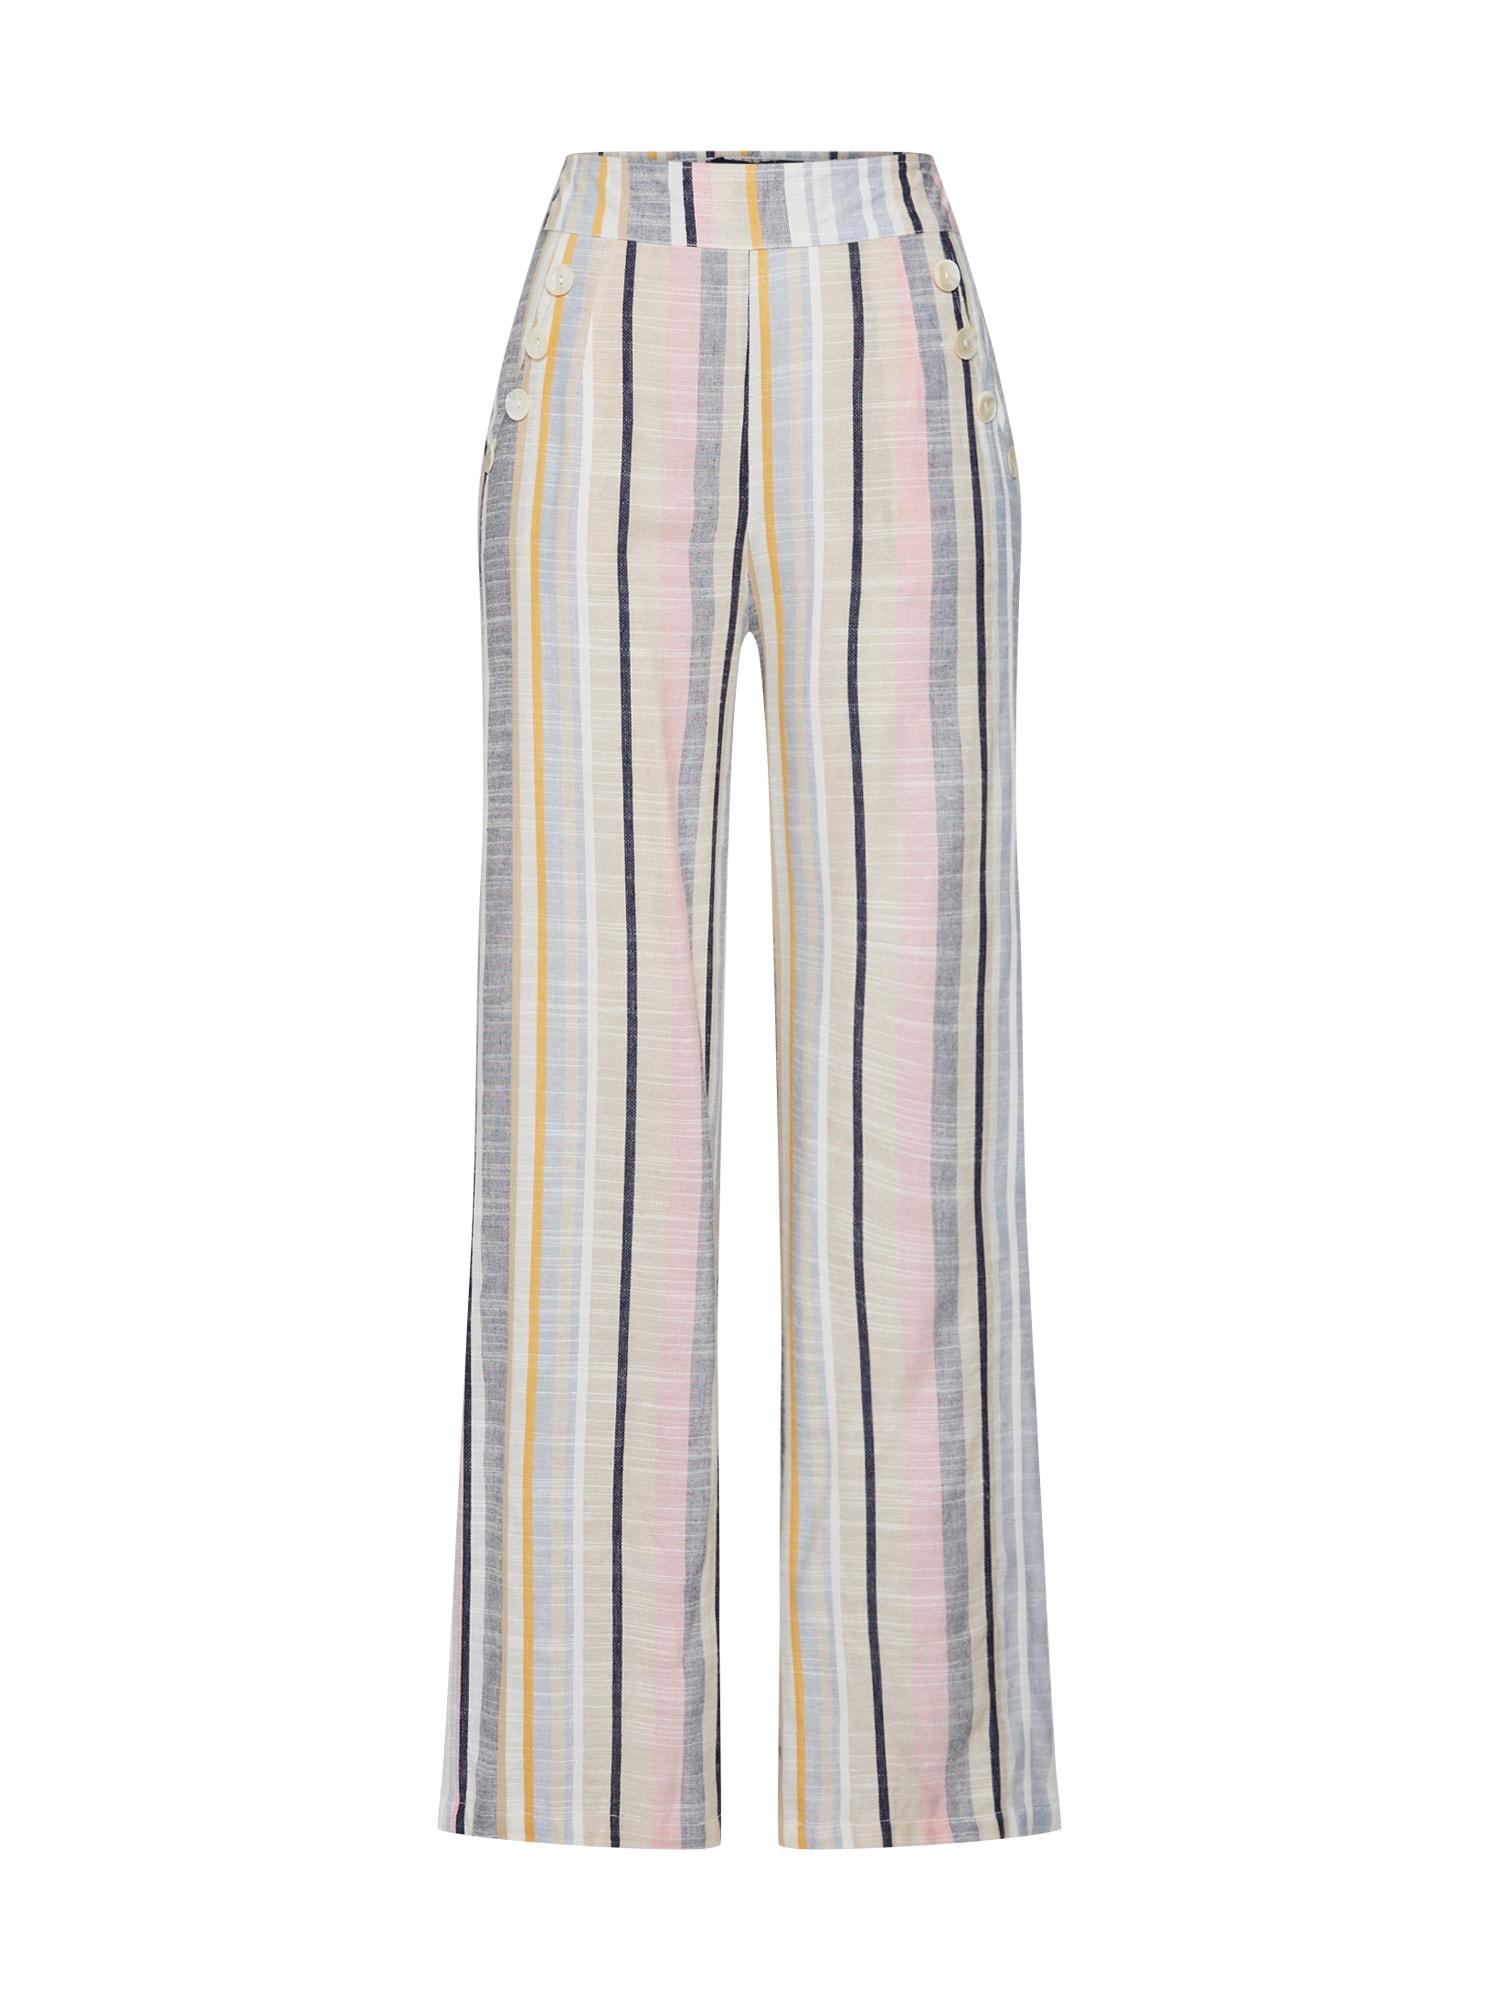 Kalhoty béžová šedá růžová Boohoo